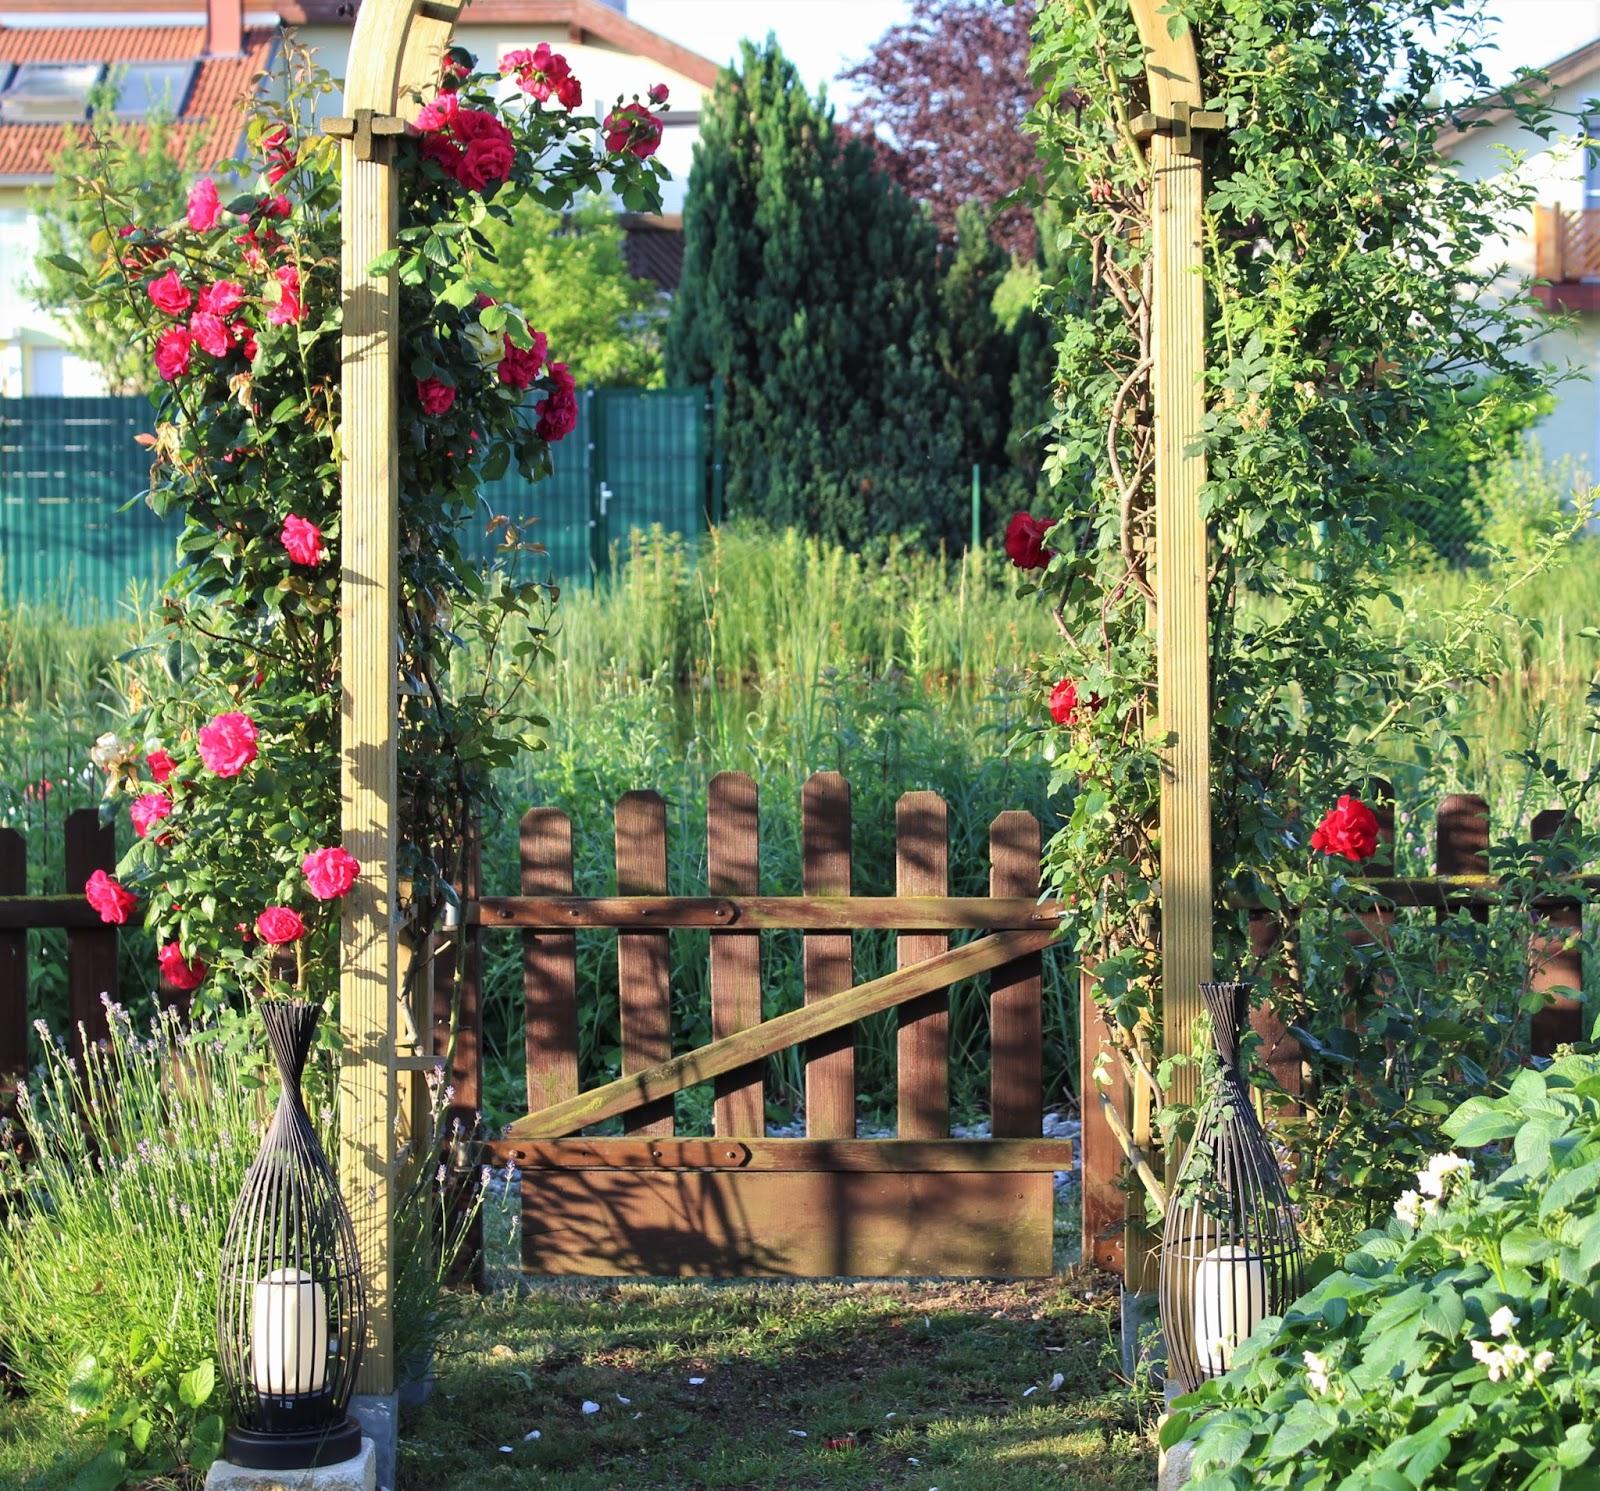 mcmaries kleingartenwelt der juni bringt die bl tenpracht. Black Bedroom Furniture Sets. Home Design Ideas